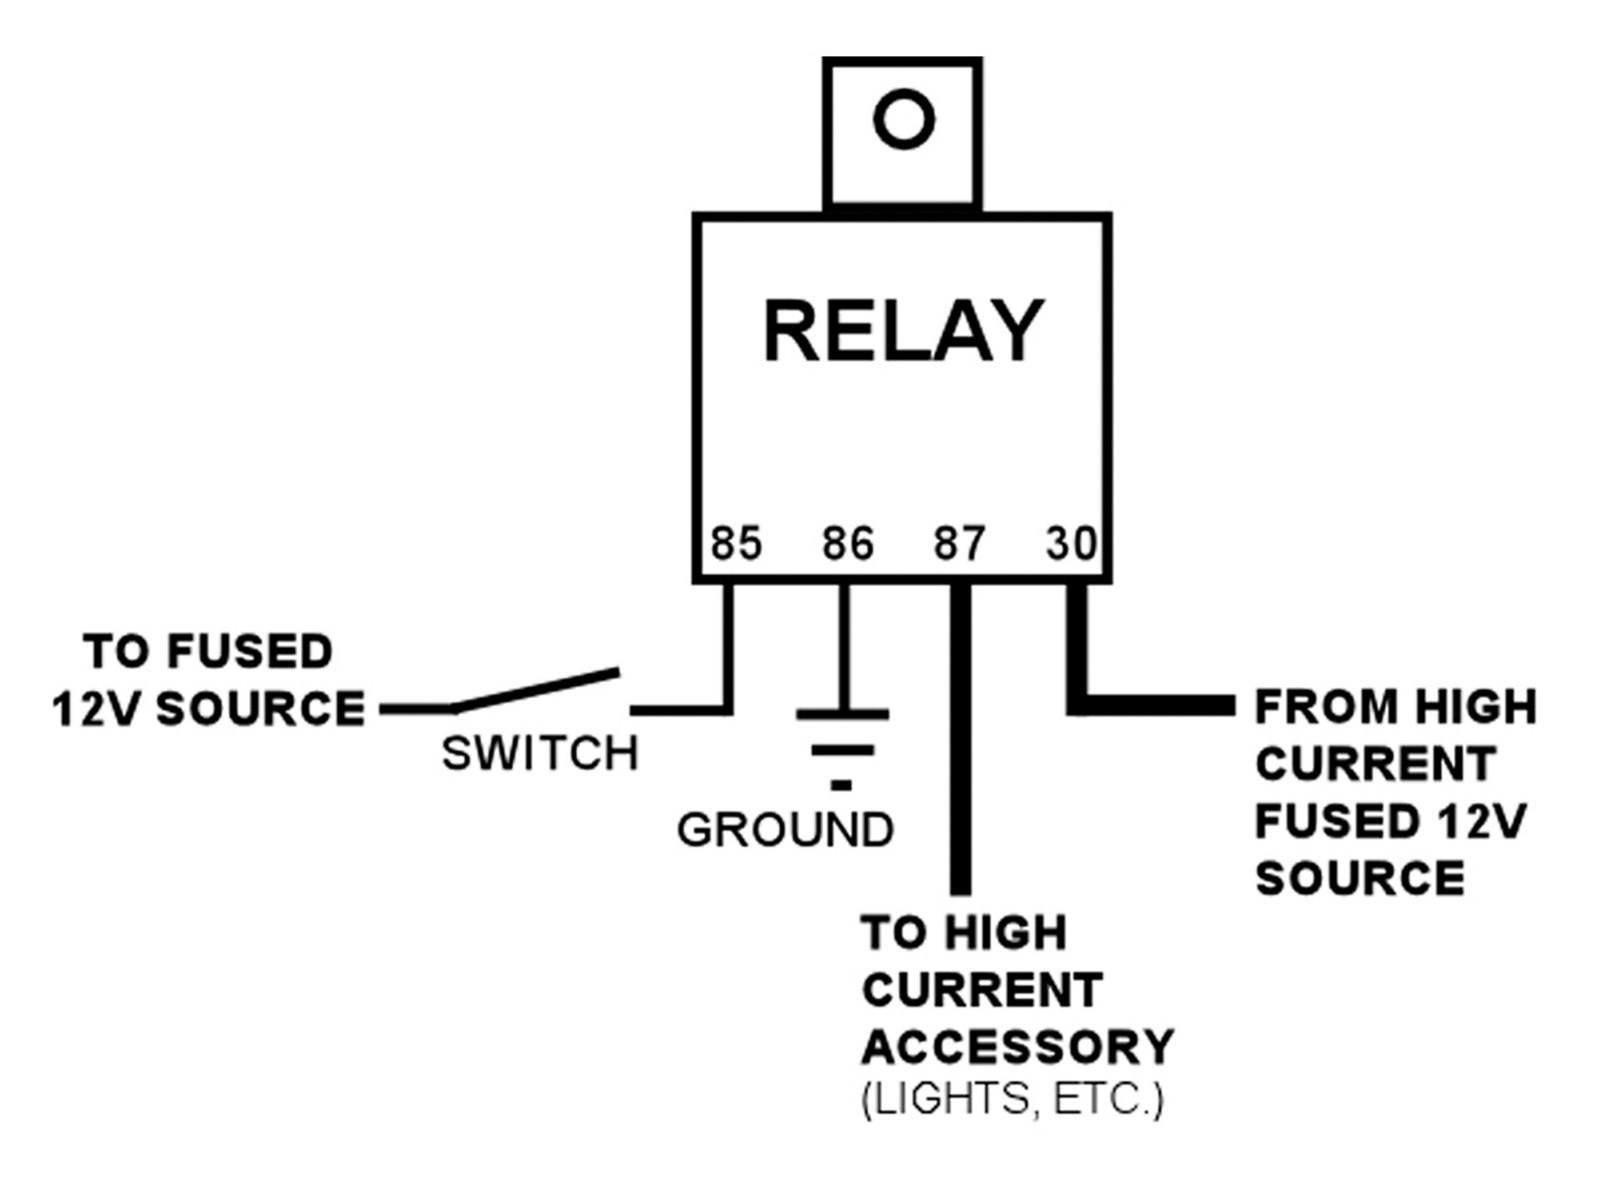 hight resolution of 12v relay wiring diagram spotlights wiring diagram for 12v auto relay valid 12v relay wiring